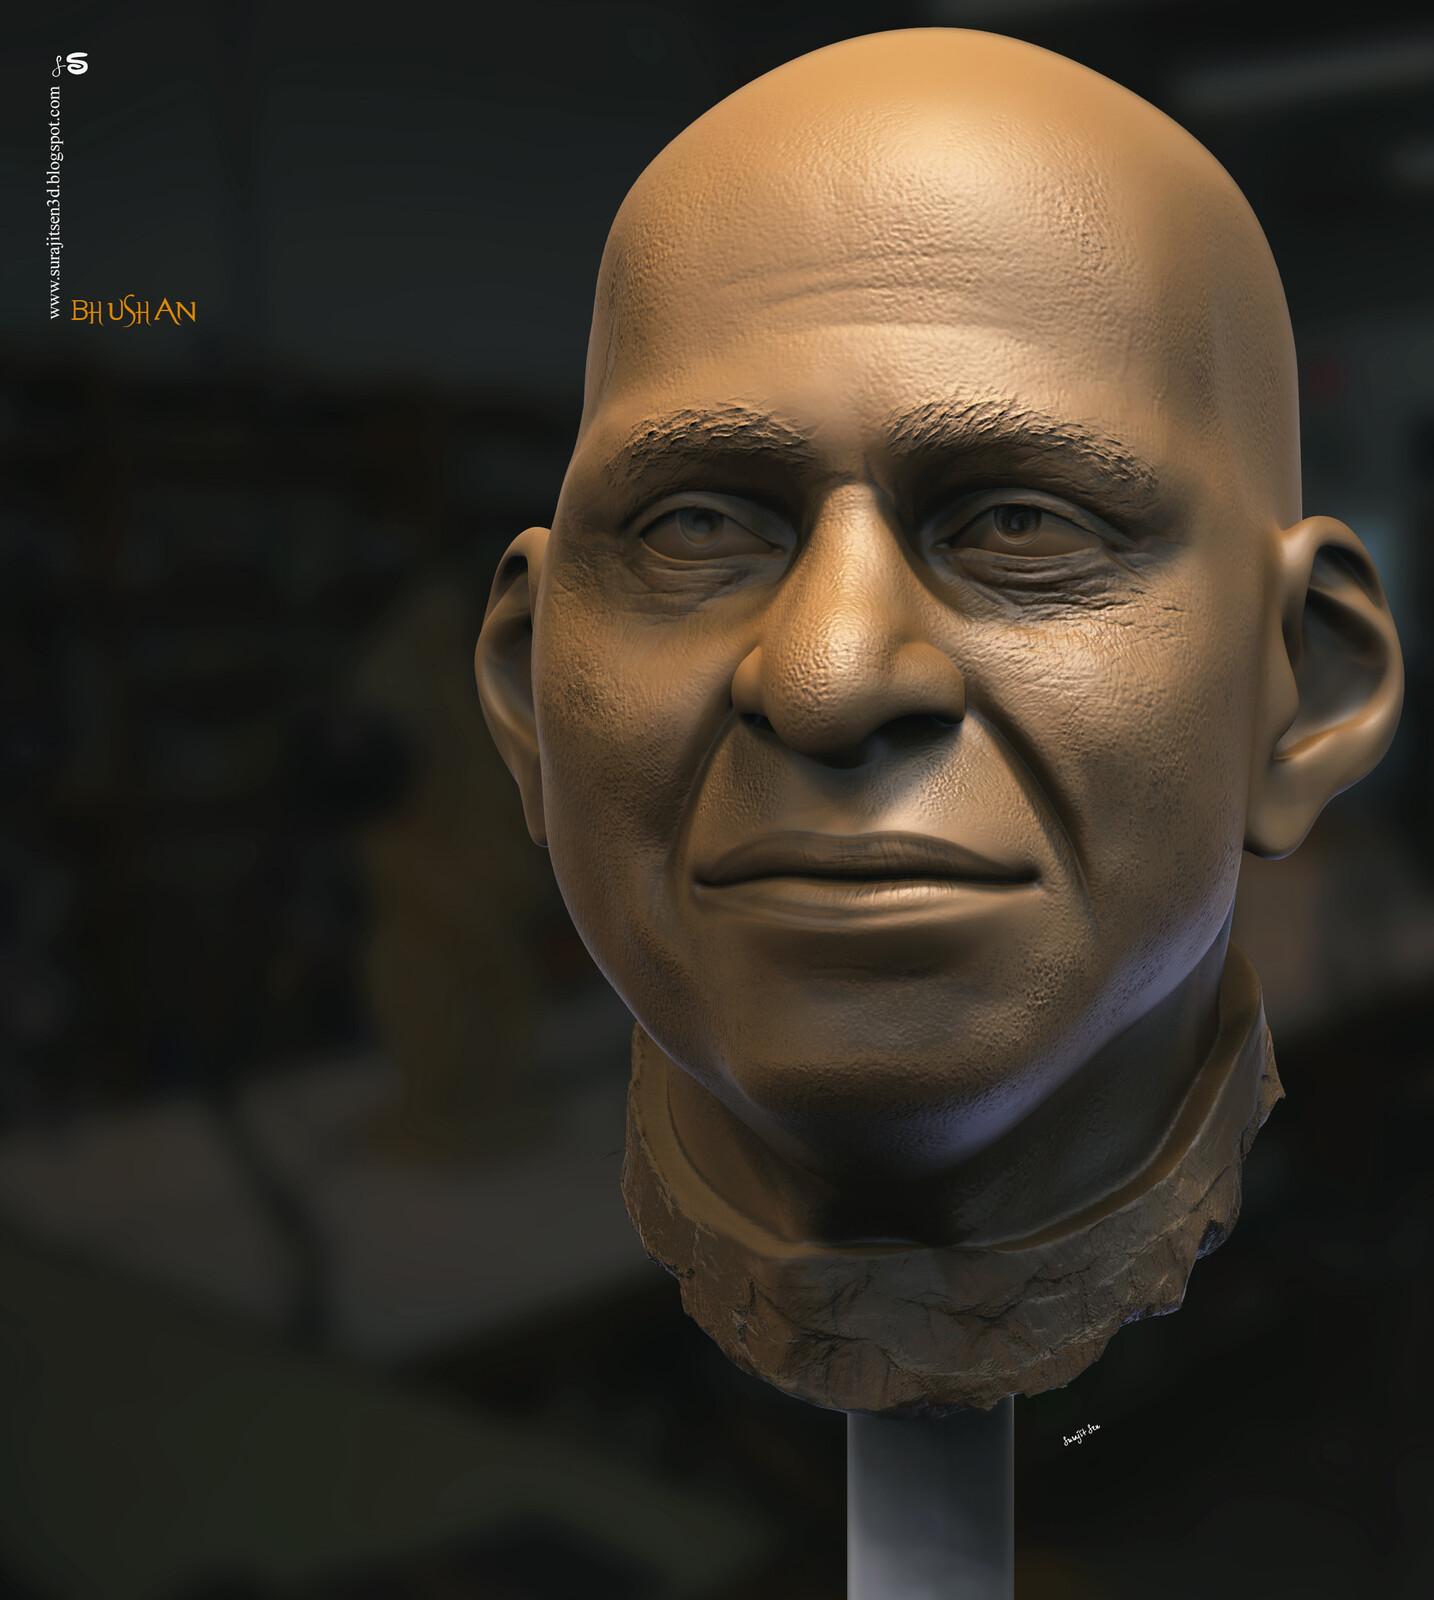 Bhushan Digital Sculpture One of my study works... Background music- #hanszimmermusic